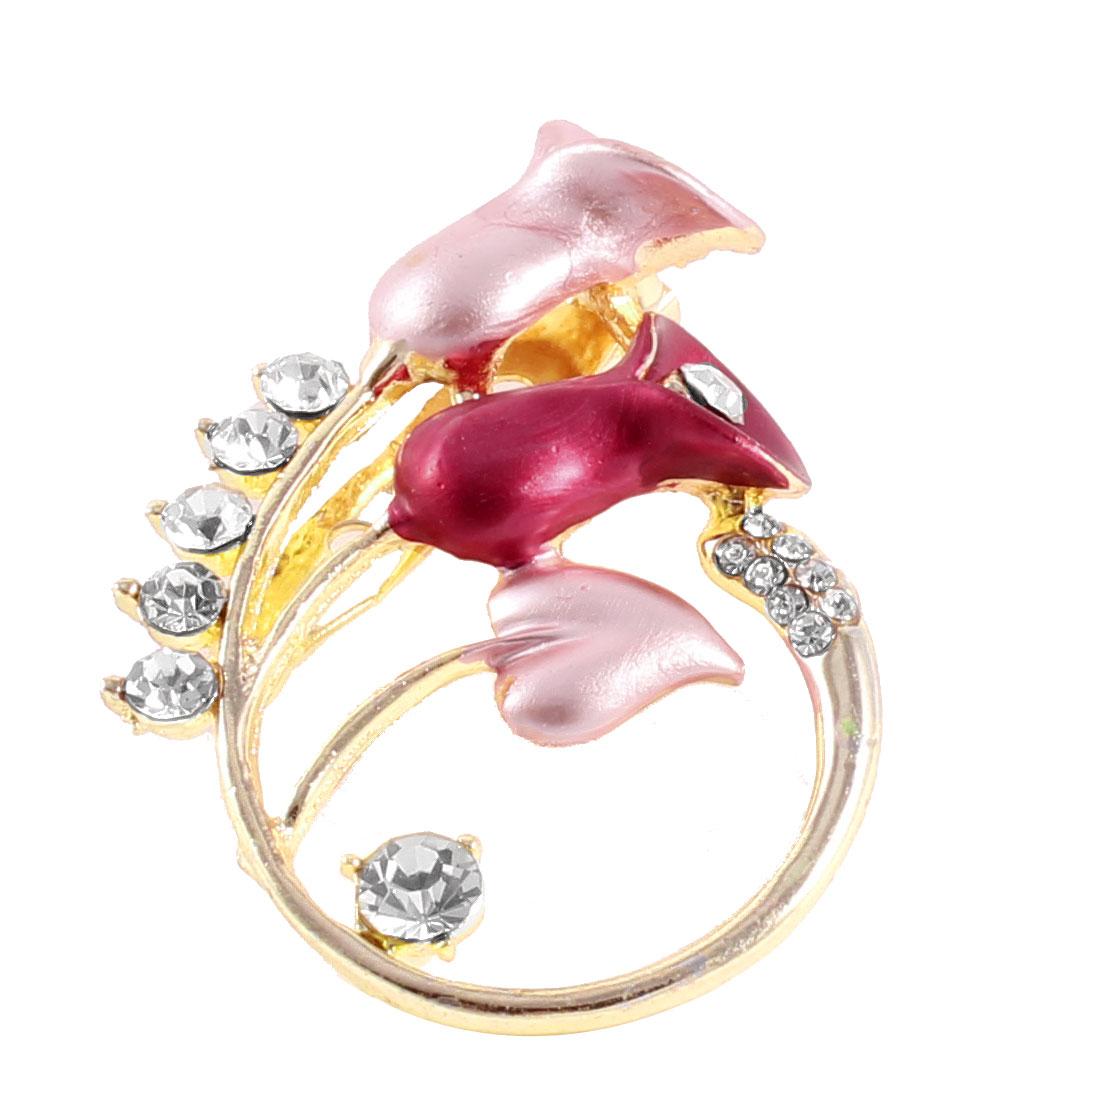 Women Rhinestones Inlaid Pink Burgundy Calla Flower Detailing Pin Brooch Ornament